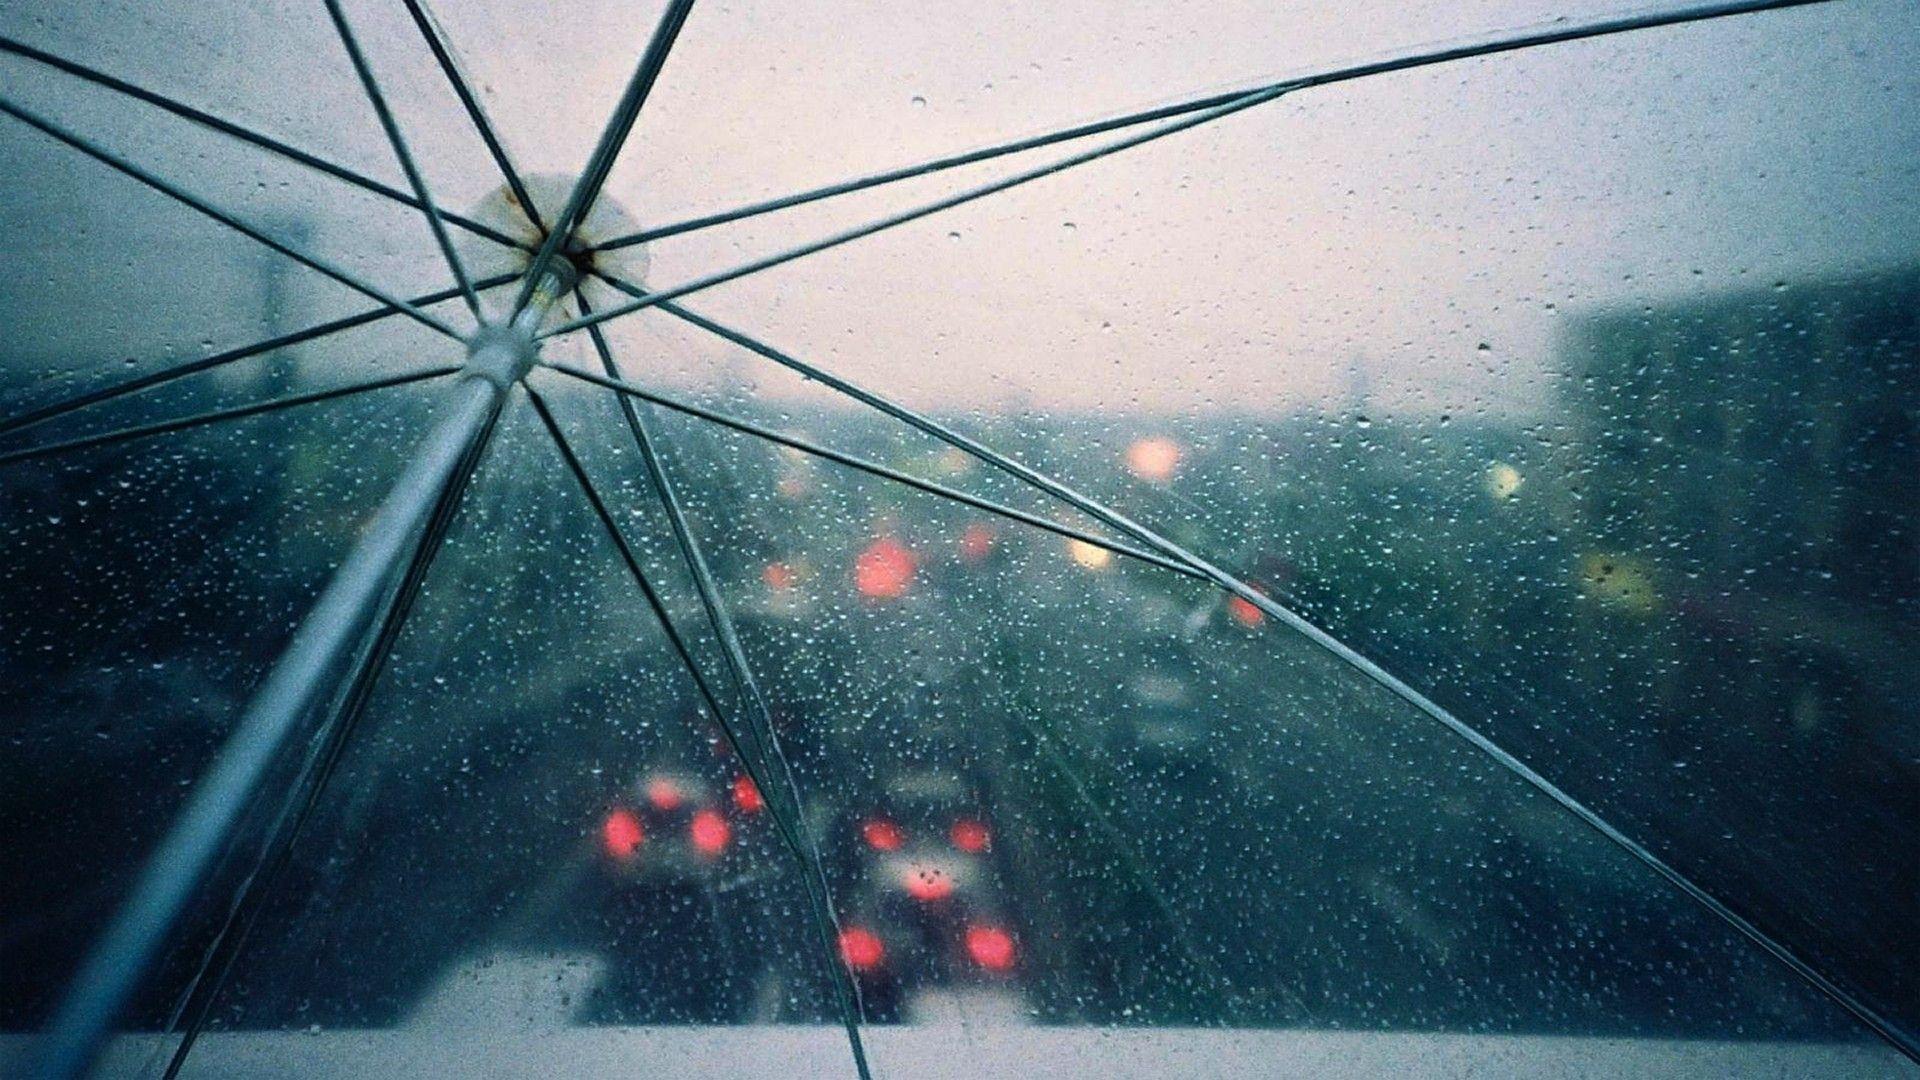 Hd wallpaper rain - Spider Man In The Rain Hd Desktop Wallpaper High Definition Raining Wallpapers Wallpapers